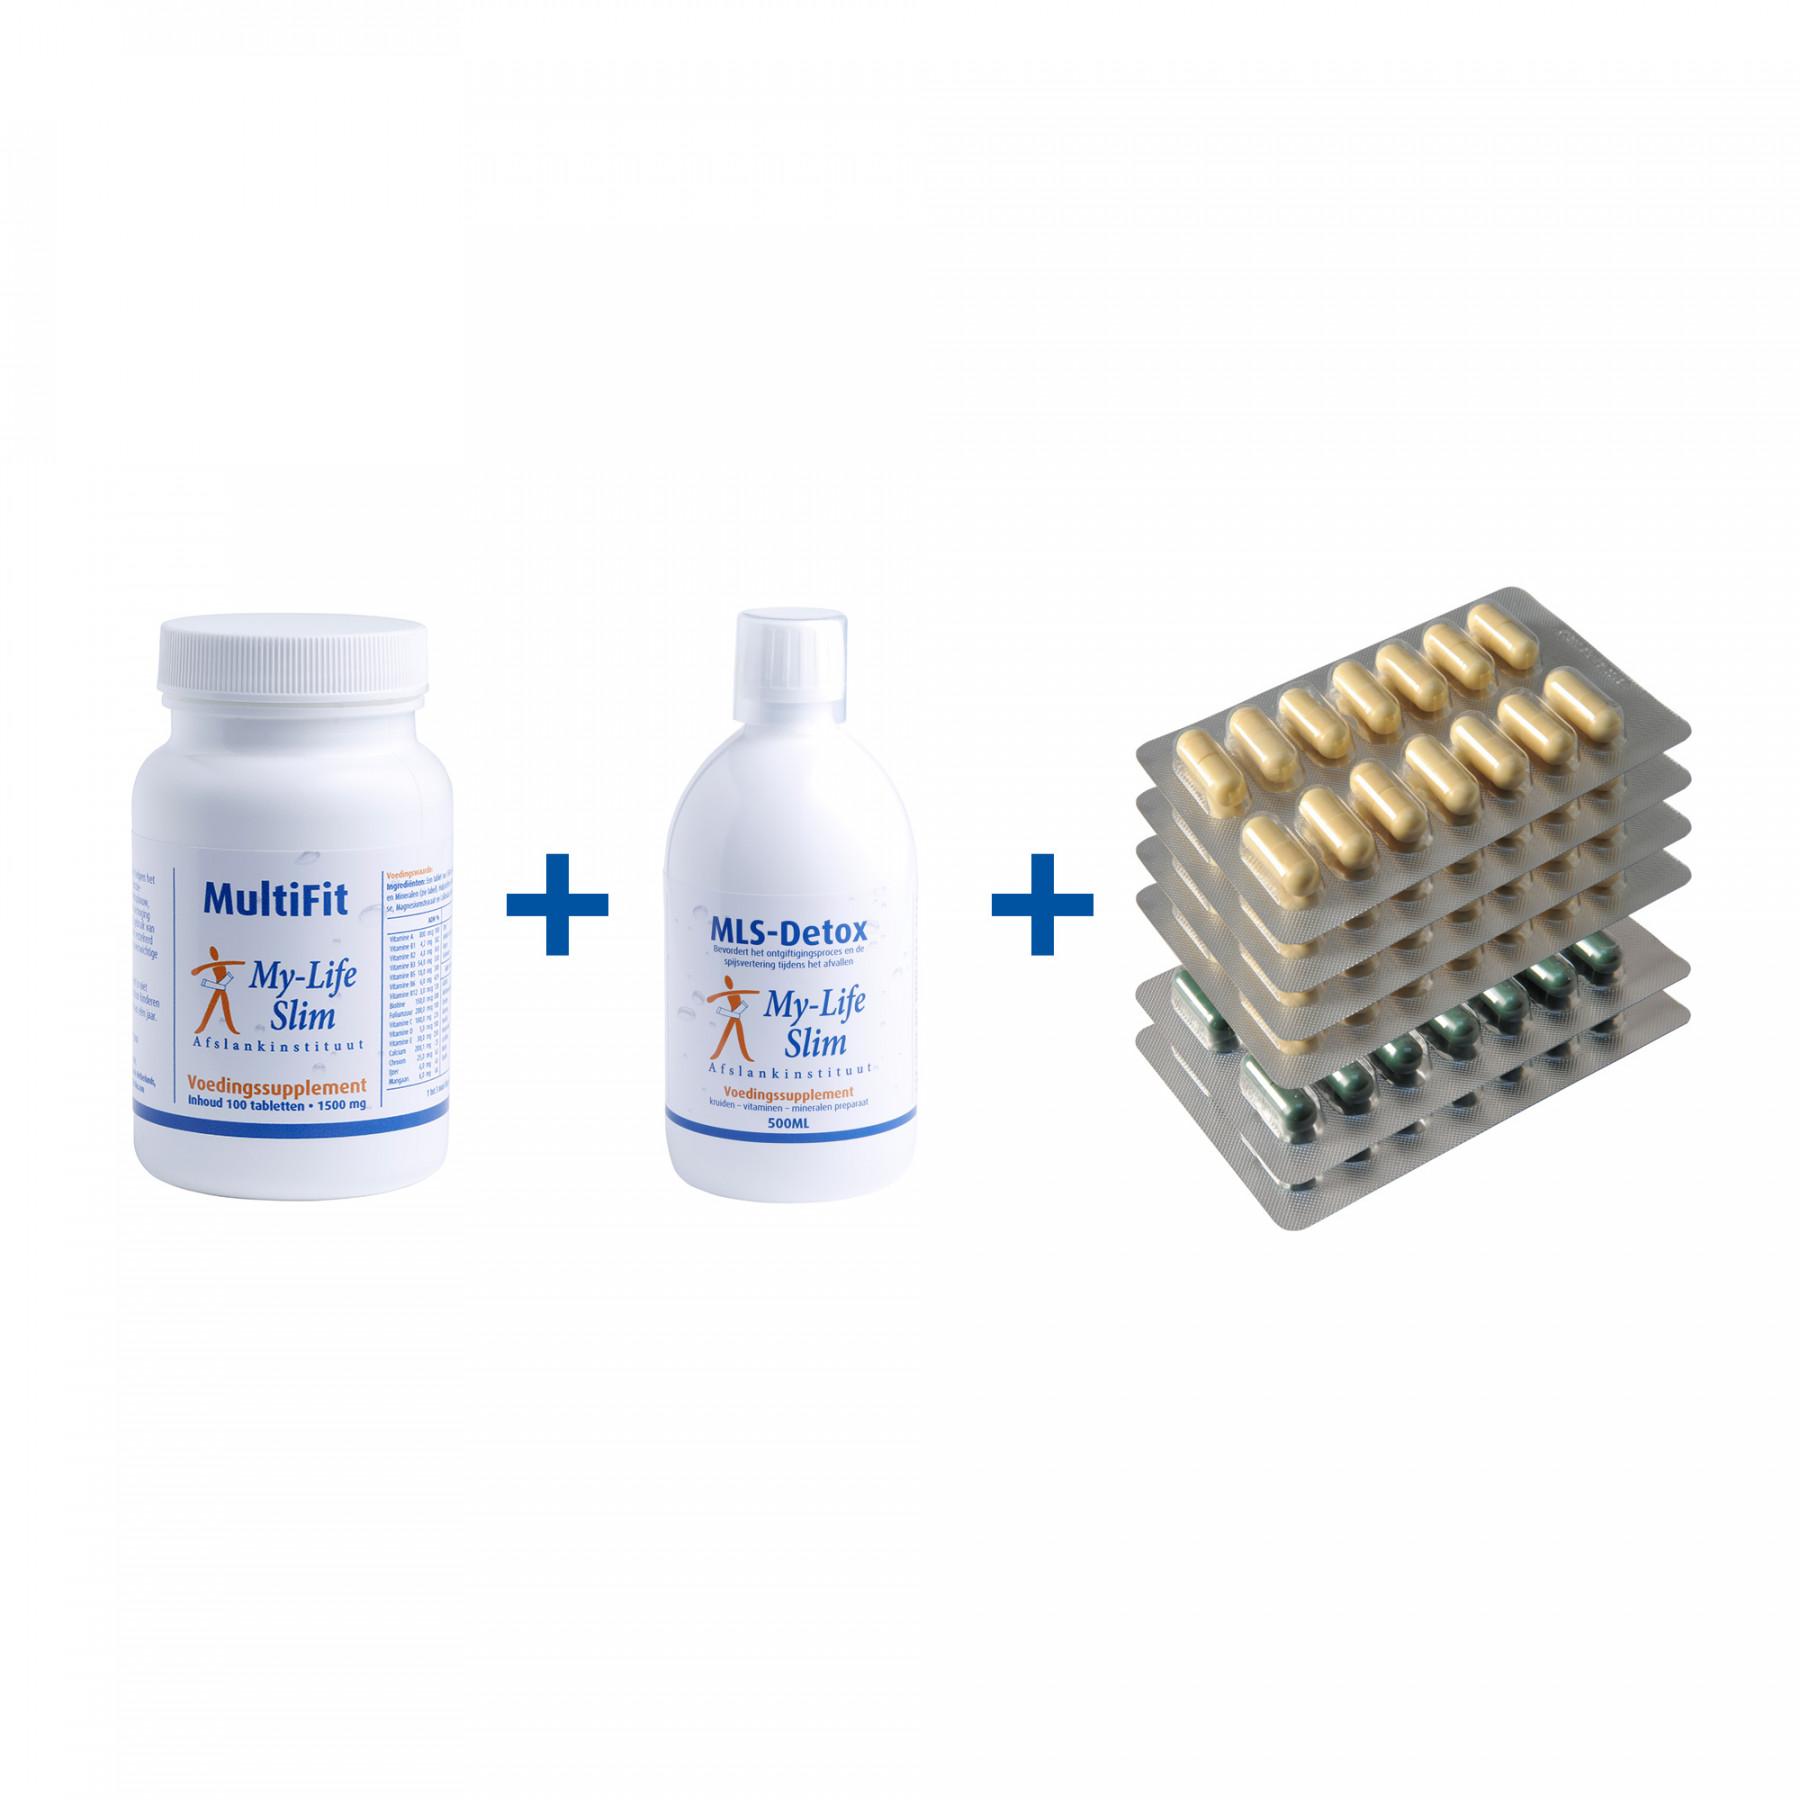 Startpakket BMI 29 of lager, 4 strips Restore + 2 strips Psyllium voor 2 weken, MultiFit-Forte, MLS-Detox